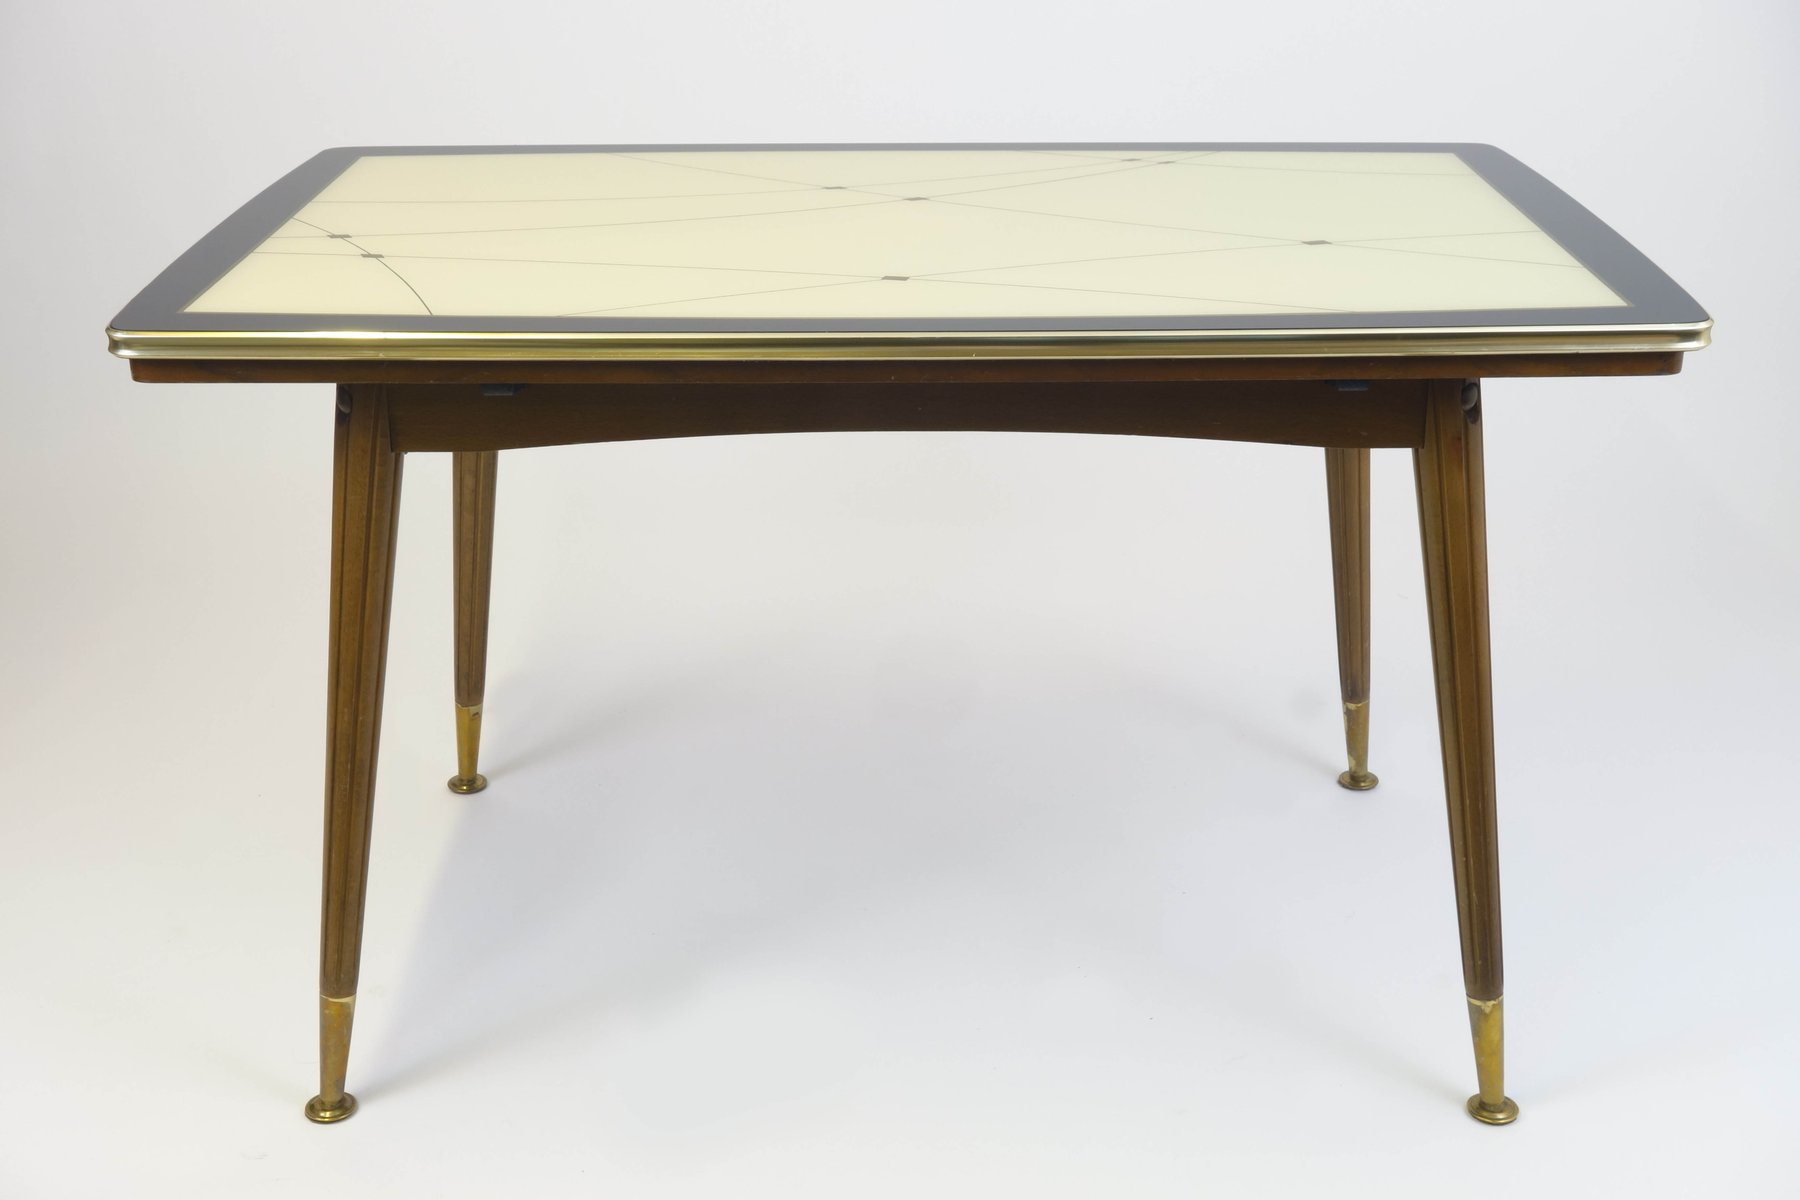 table d 39 appoint vintage avec dessus en verre 1961 en vente sur pamono. Black Bedroom Furniture Sets. Home Design Ideas